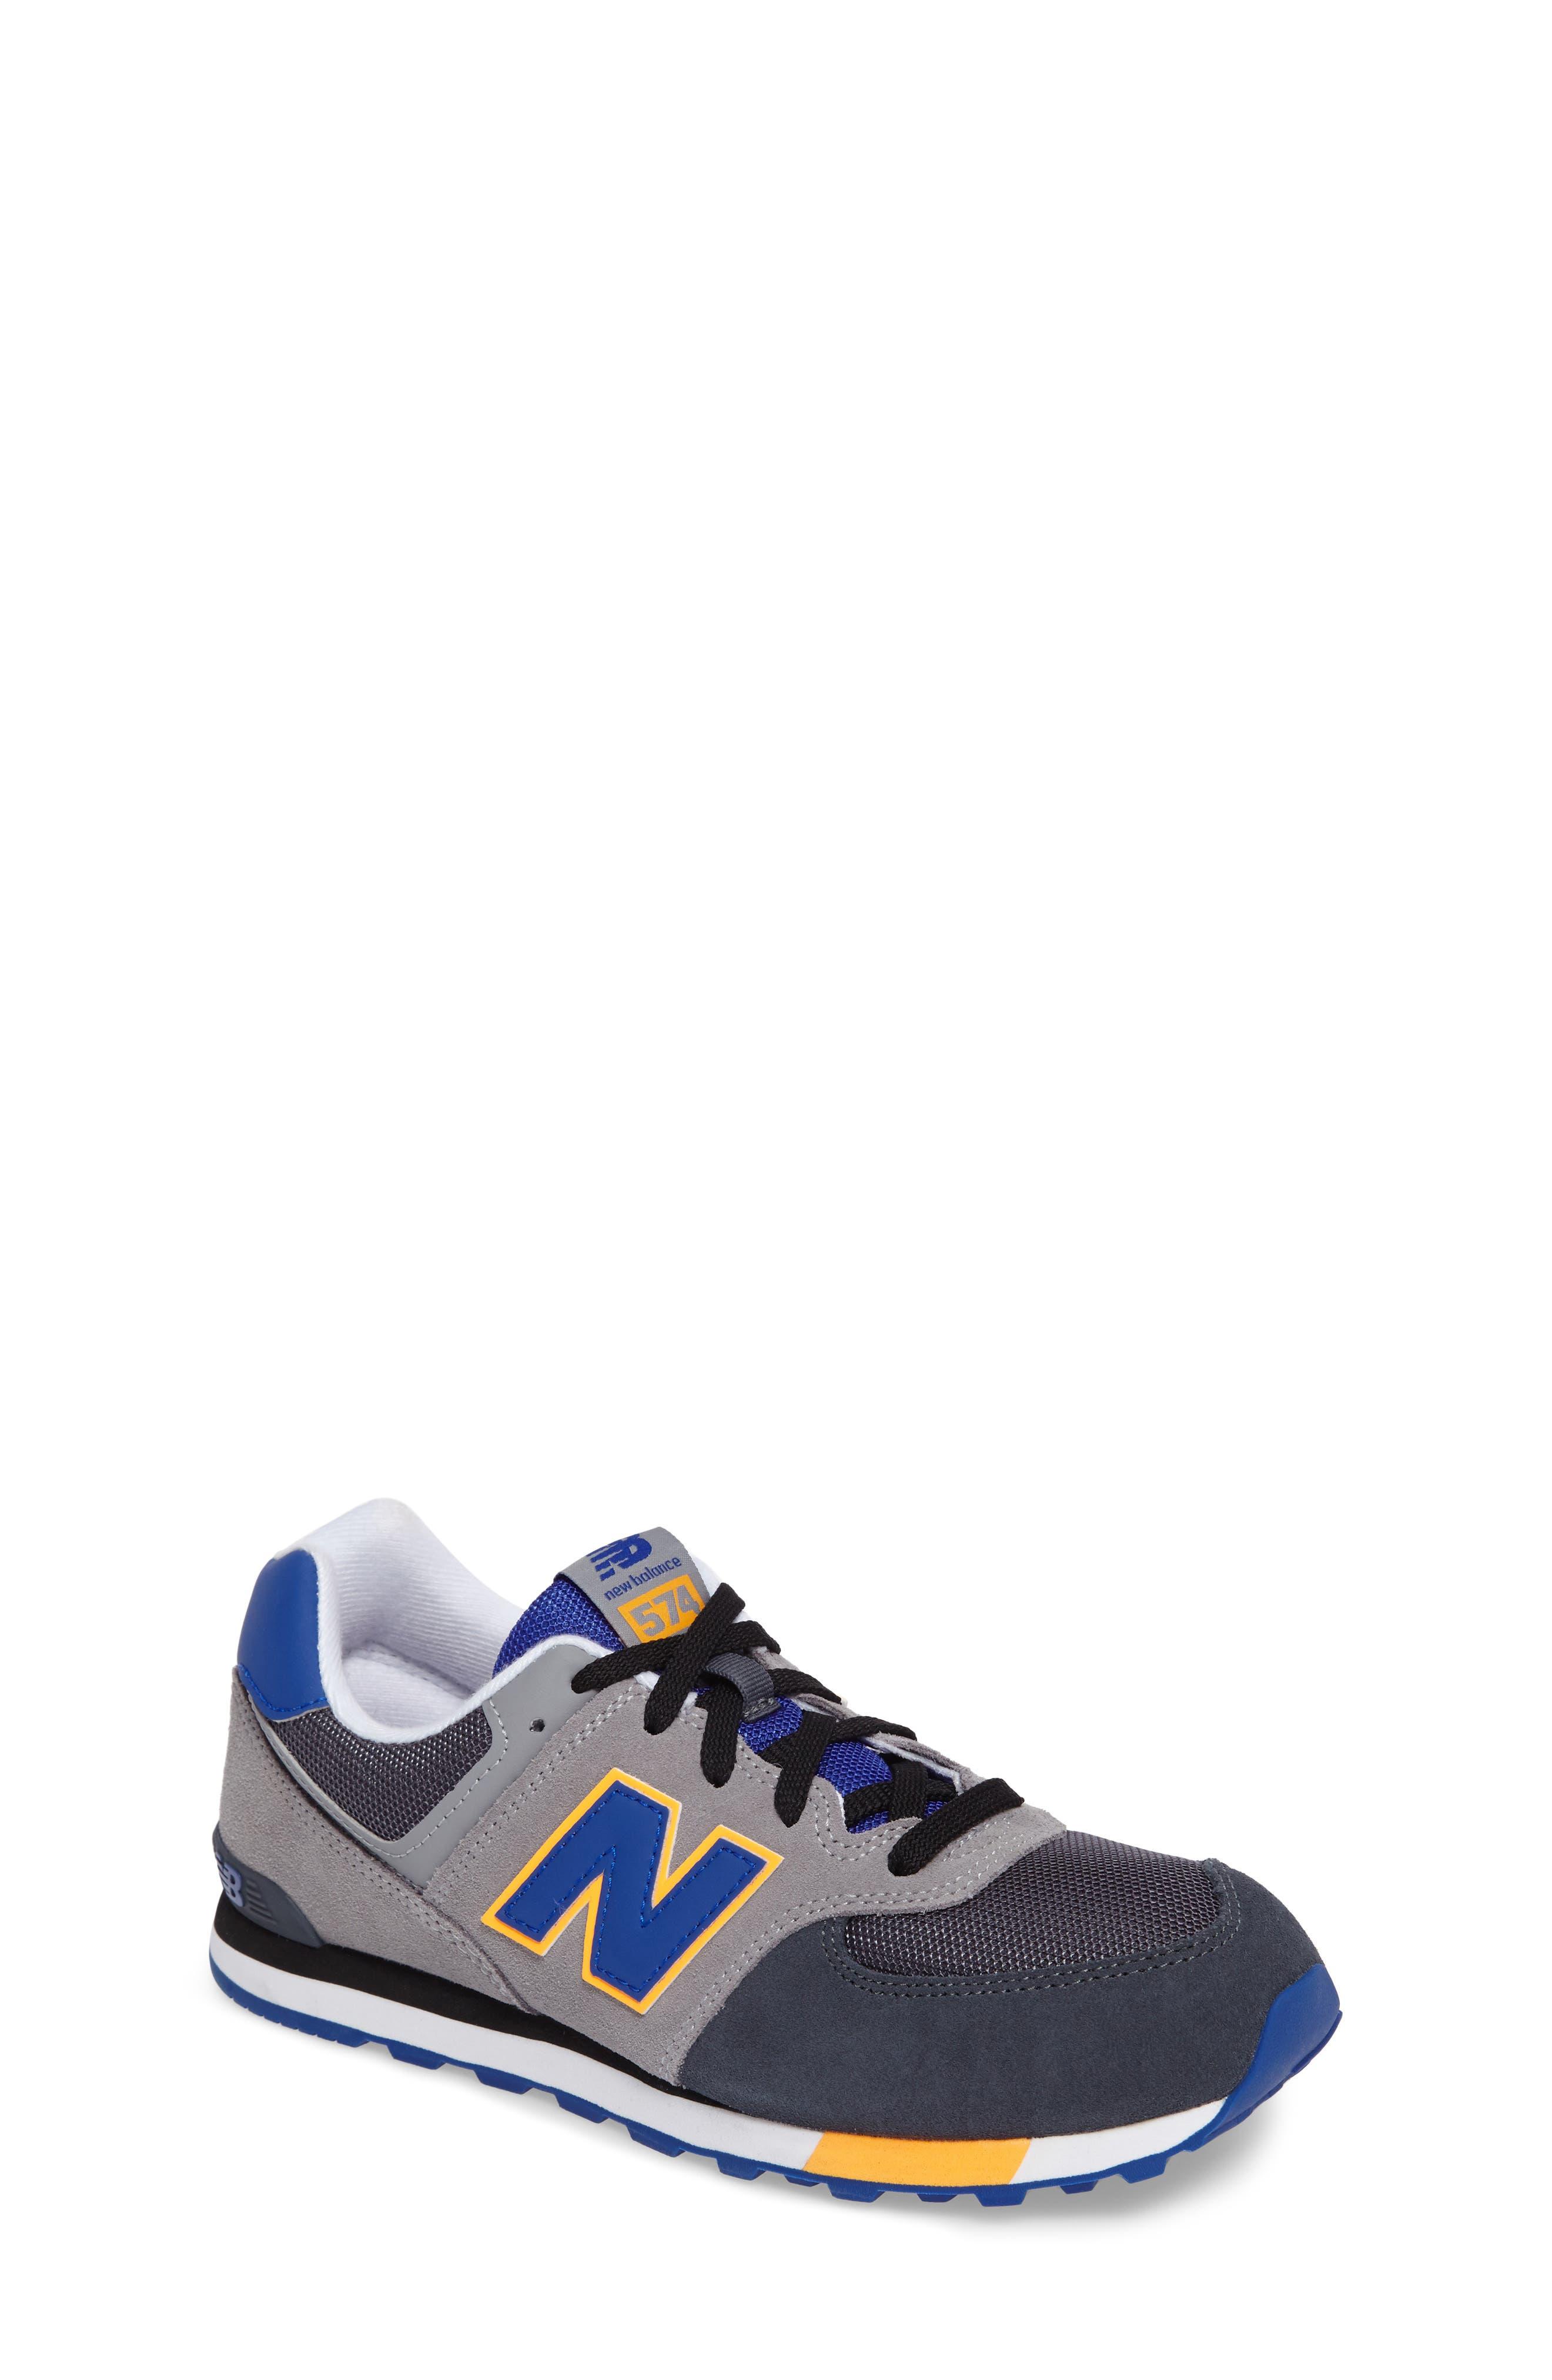 New Balance 574 Cut & Paste Sneaker (Big Kid)